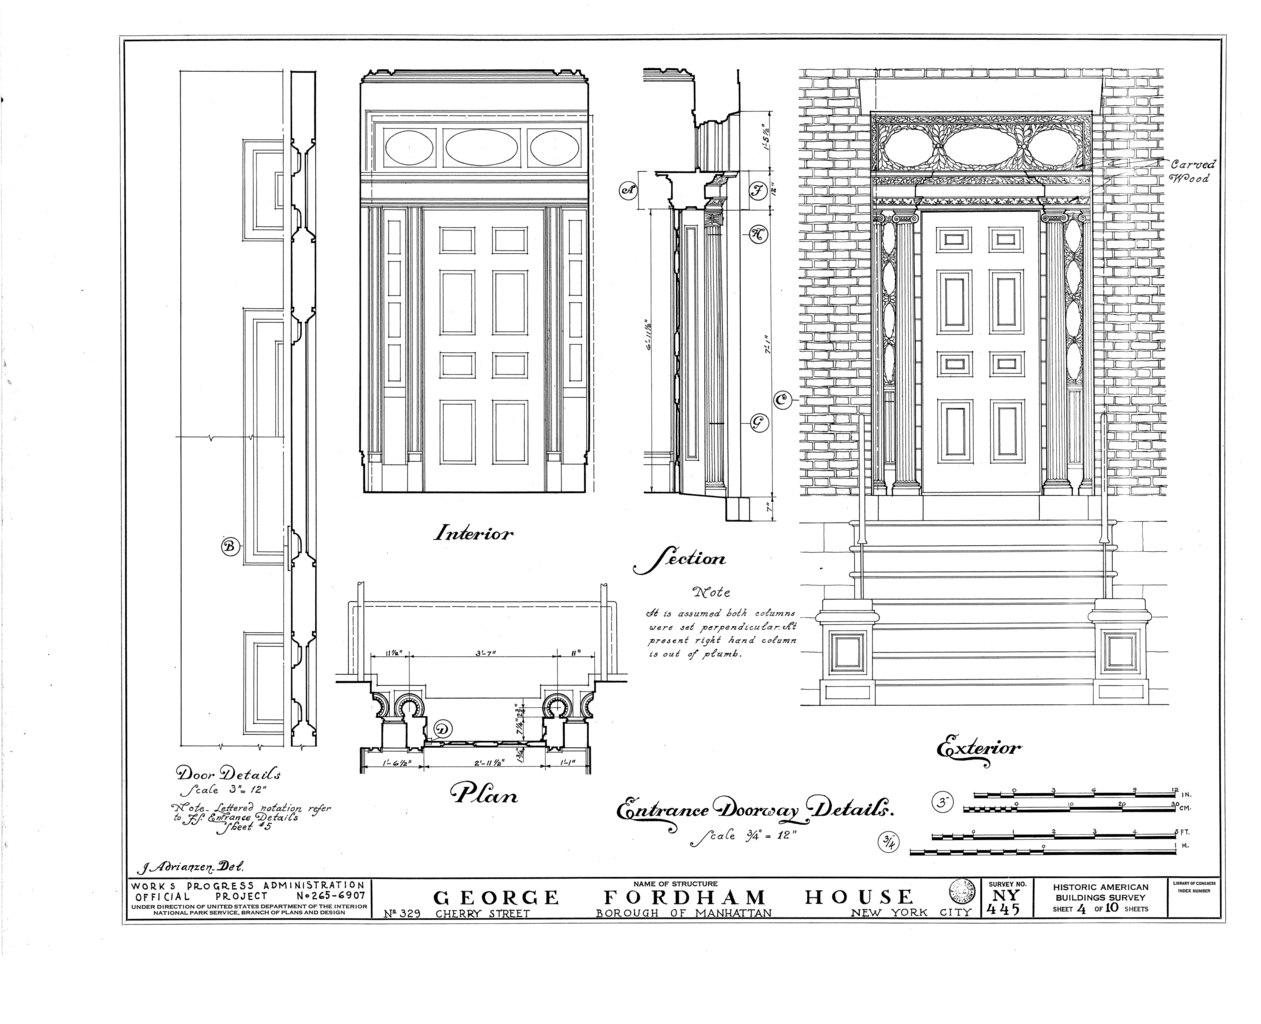 File George Fordham House 329 Cherry Street New York